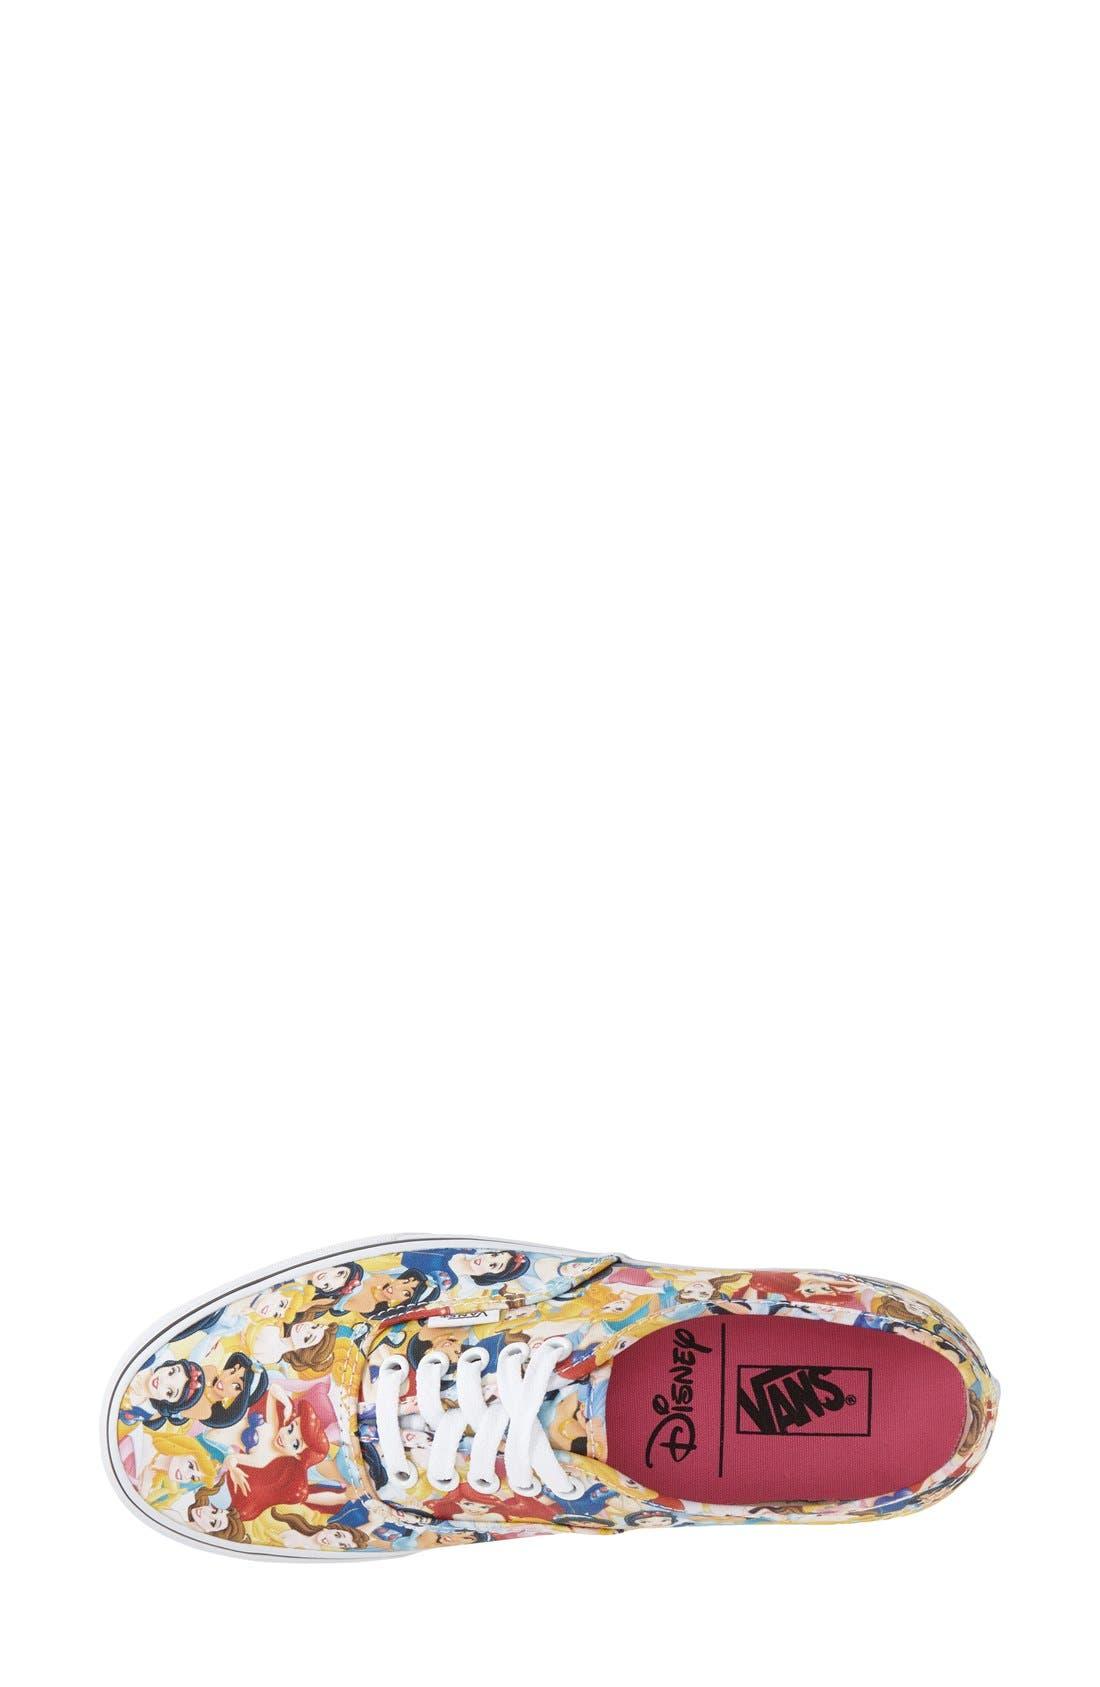 Alternate Image 3  - Vans 'Authentic - Disney®' Sneaker (Women)